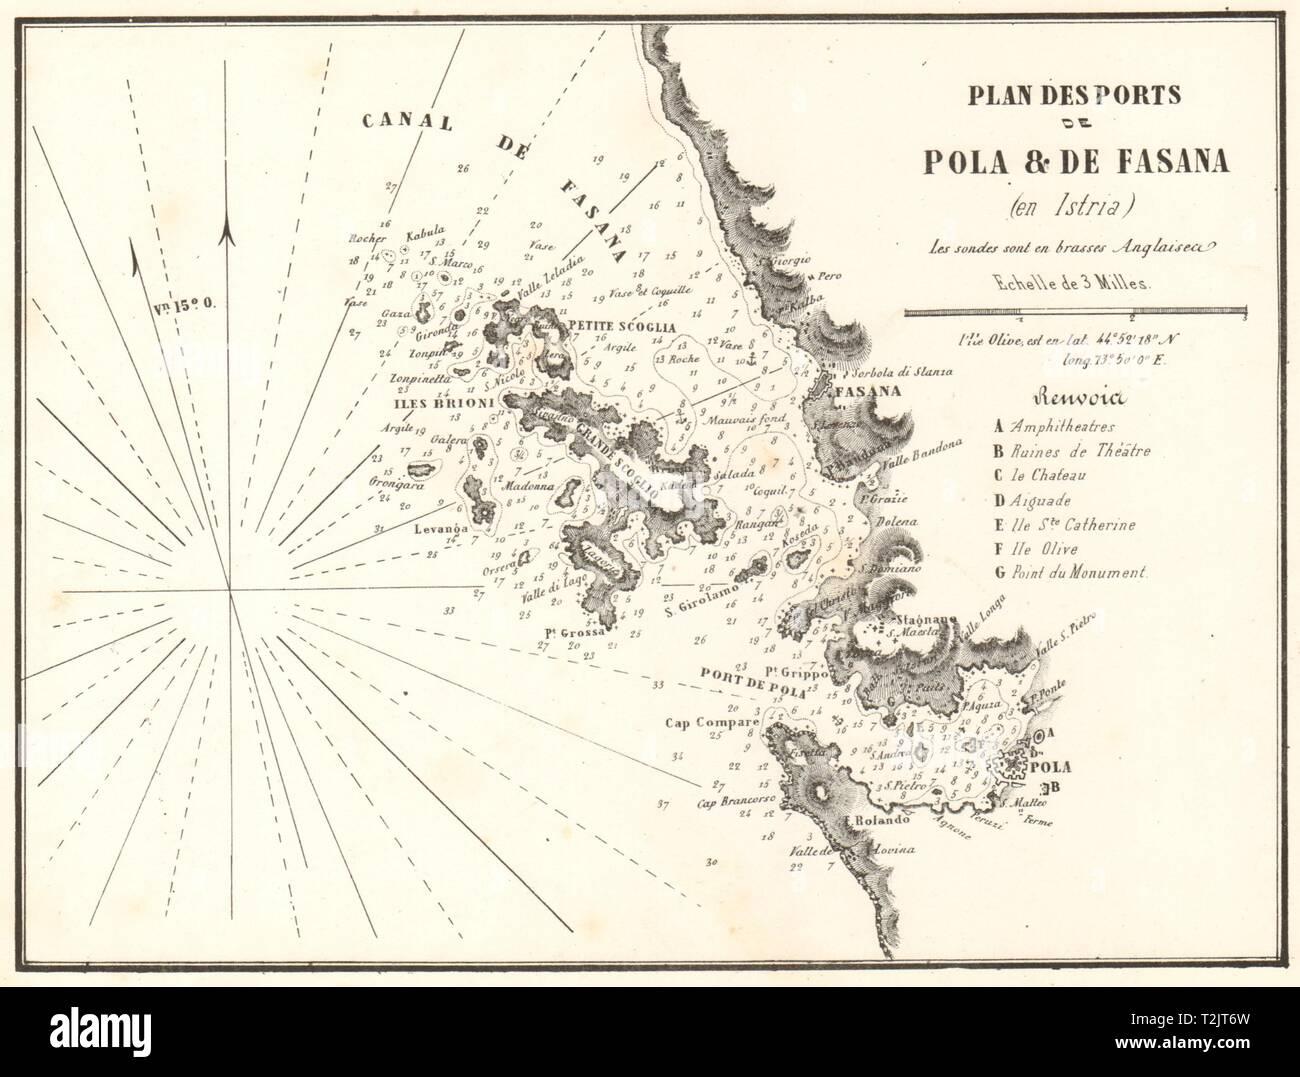 Pula & Fazana. 'Ports de Pola & de Fasana'. Istria Croatia. GAUTTIER 1854 map - Stock Image